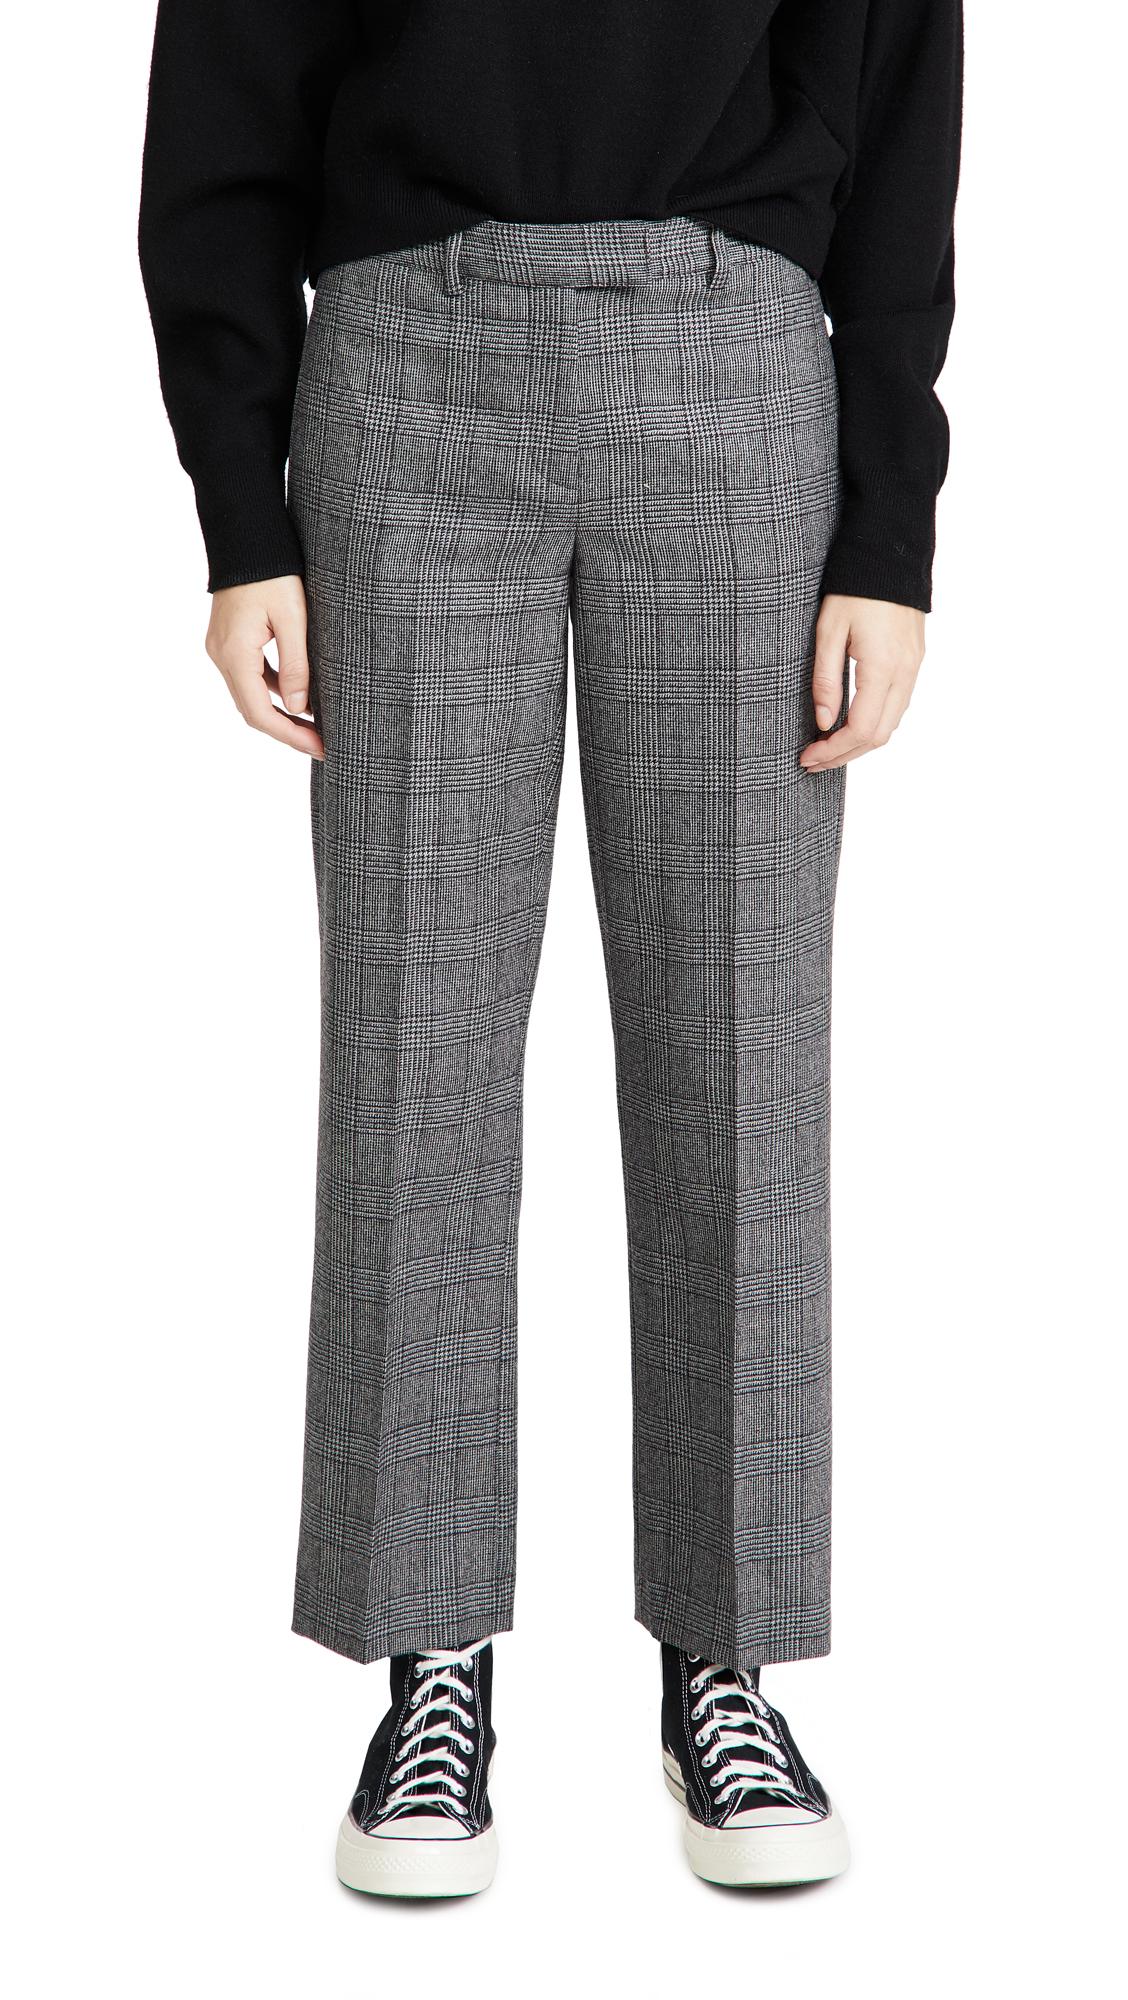 A.P.C. Pantalon Cece Pants